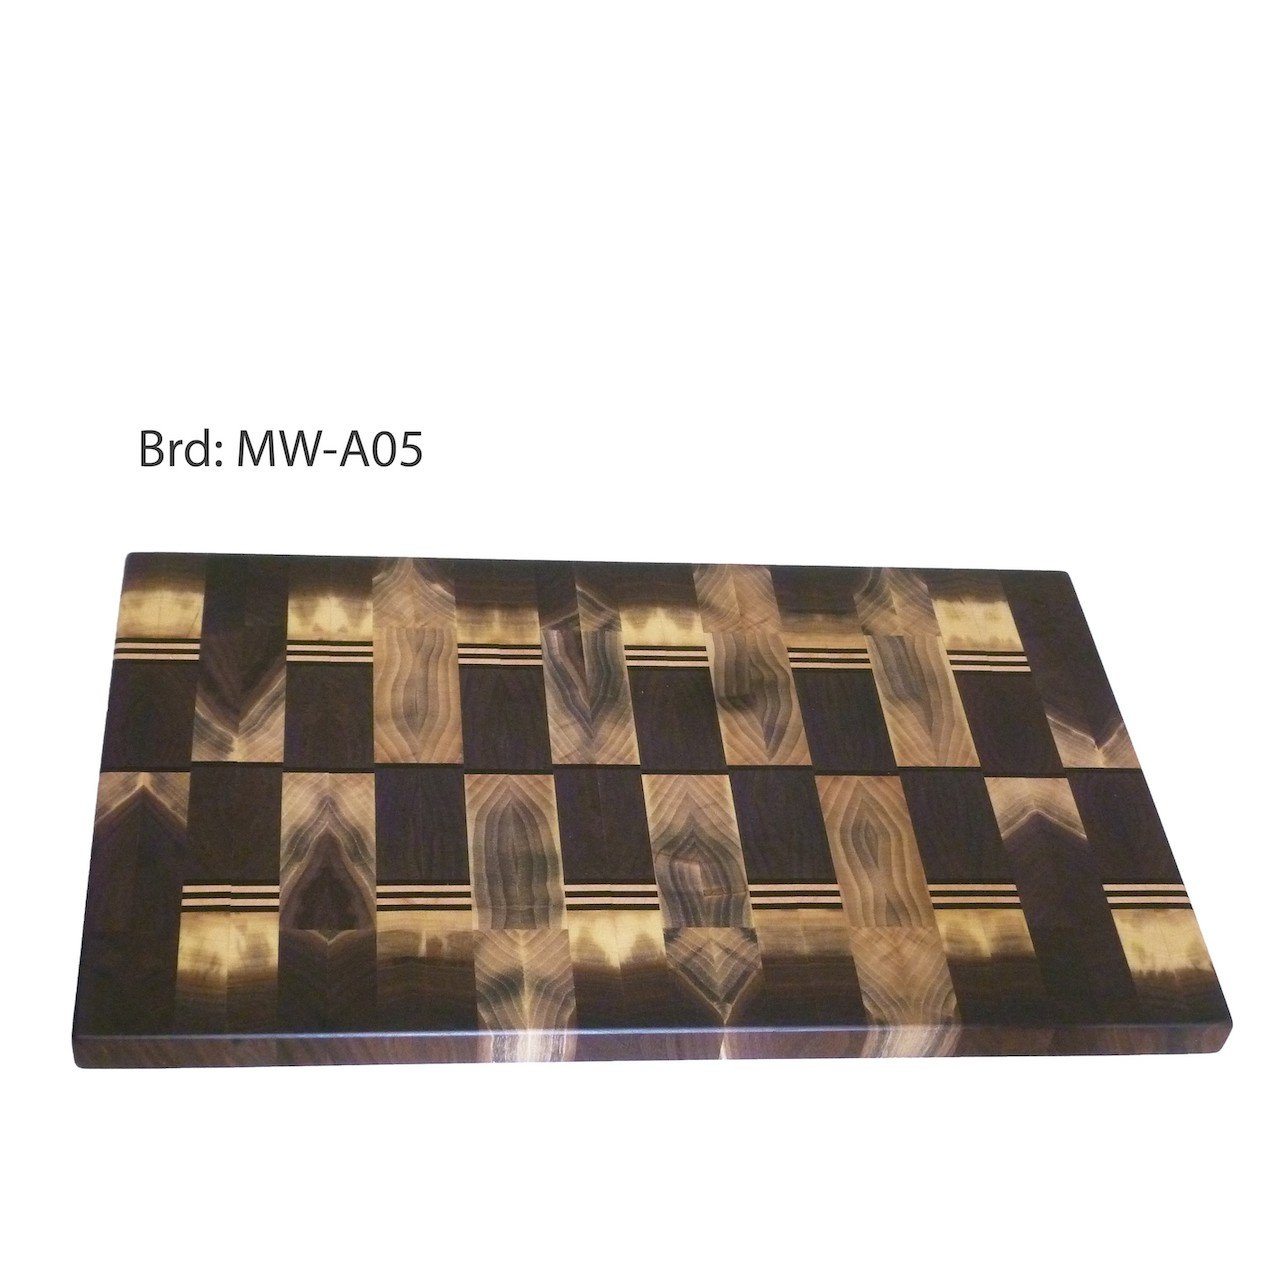 MW-A05